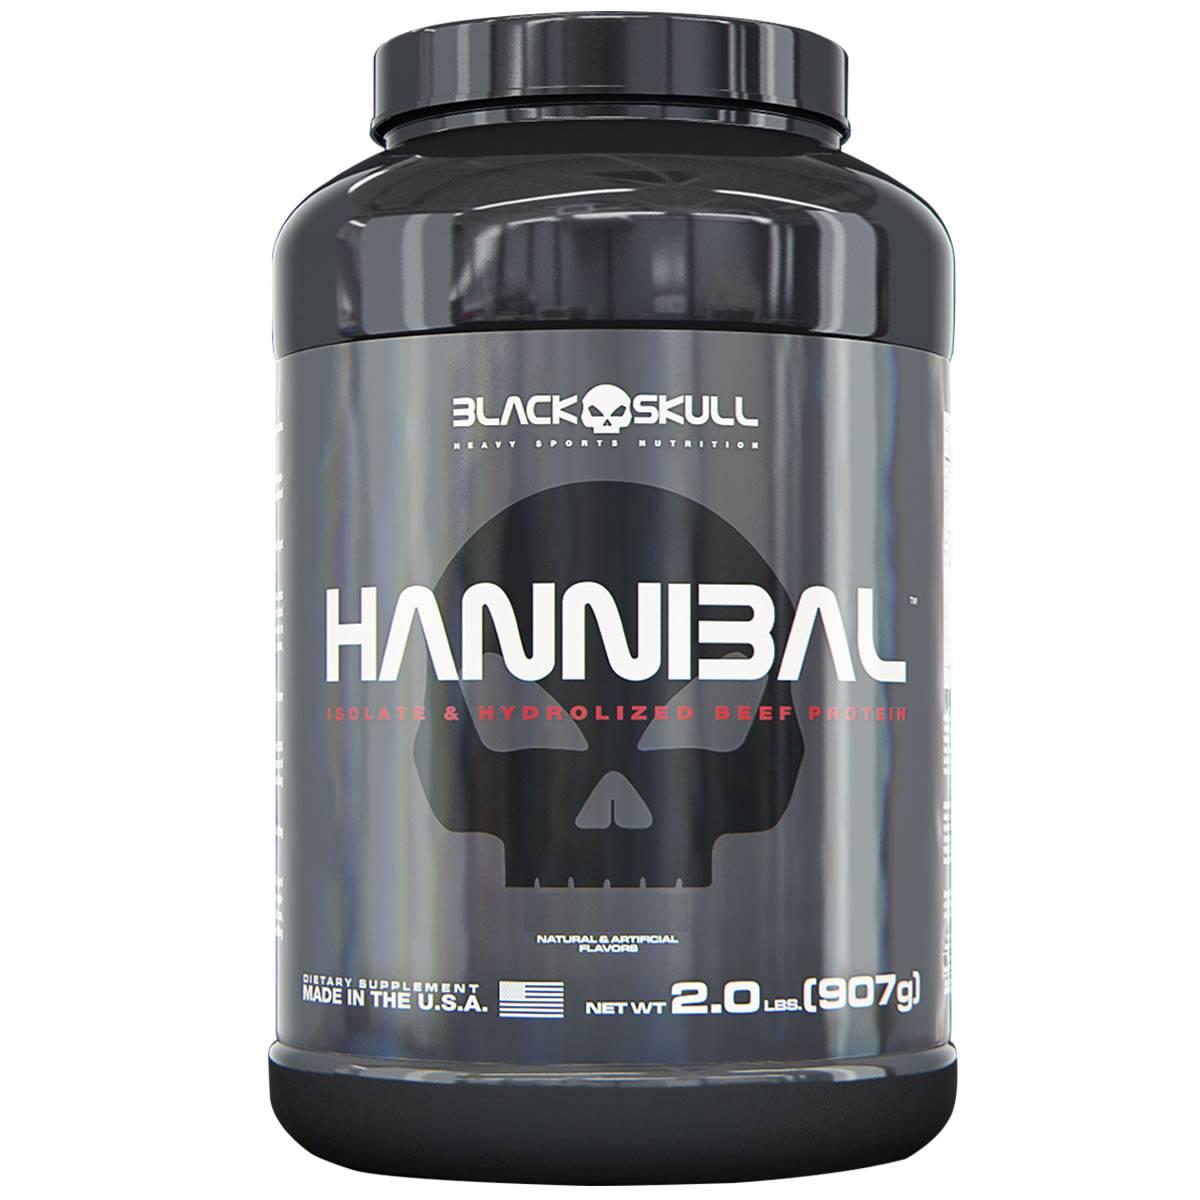 Hannibal 900 g - Black Skull